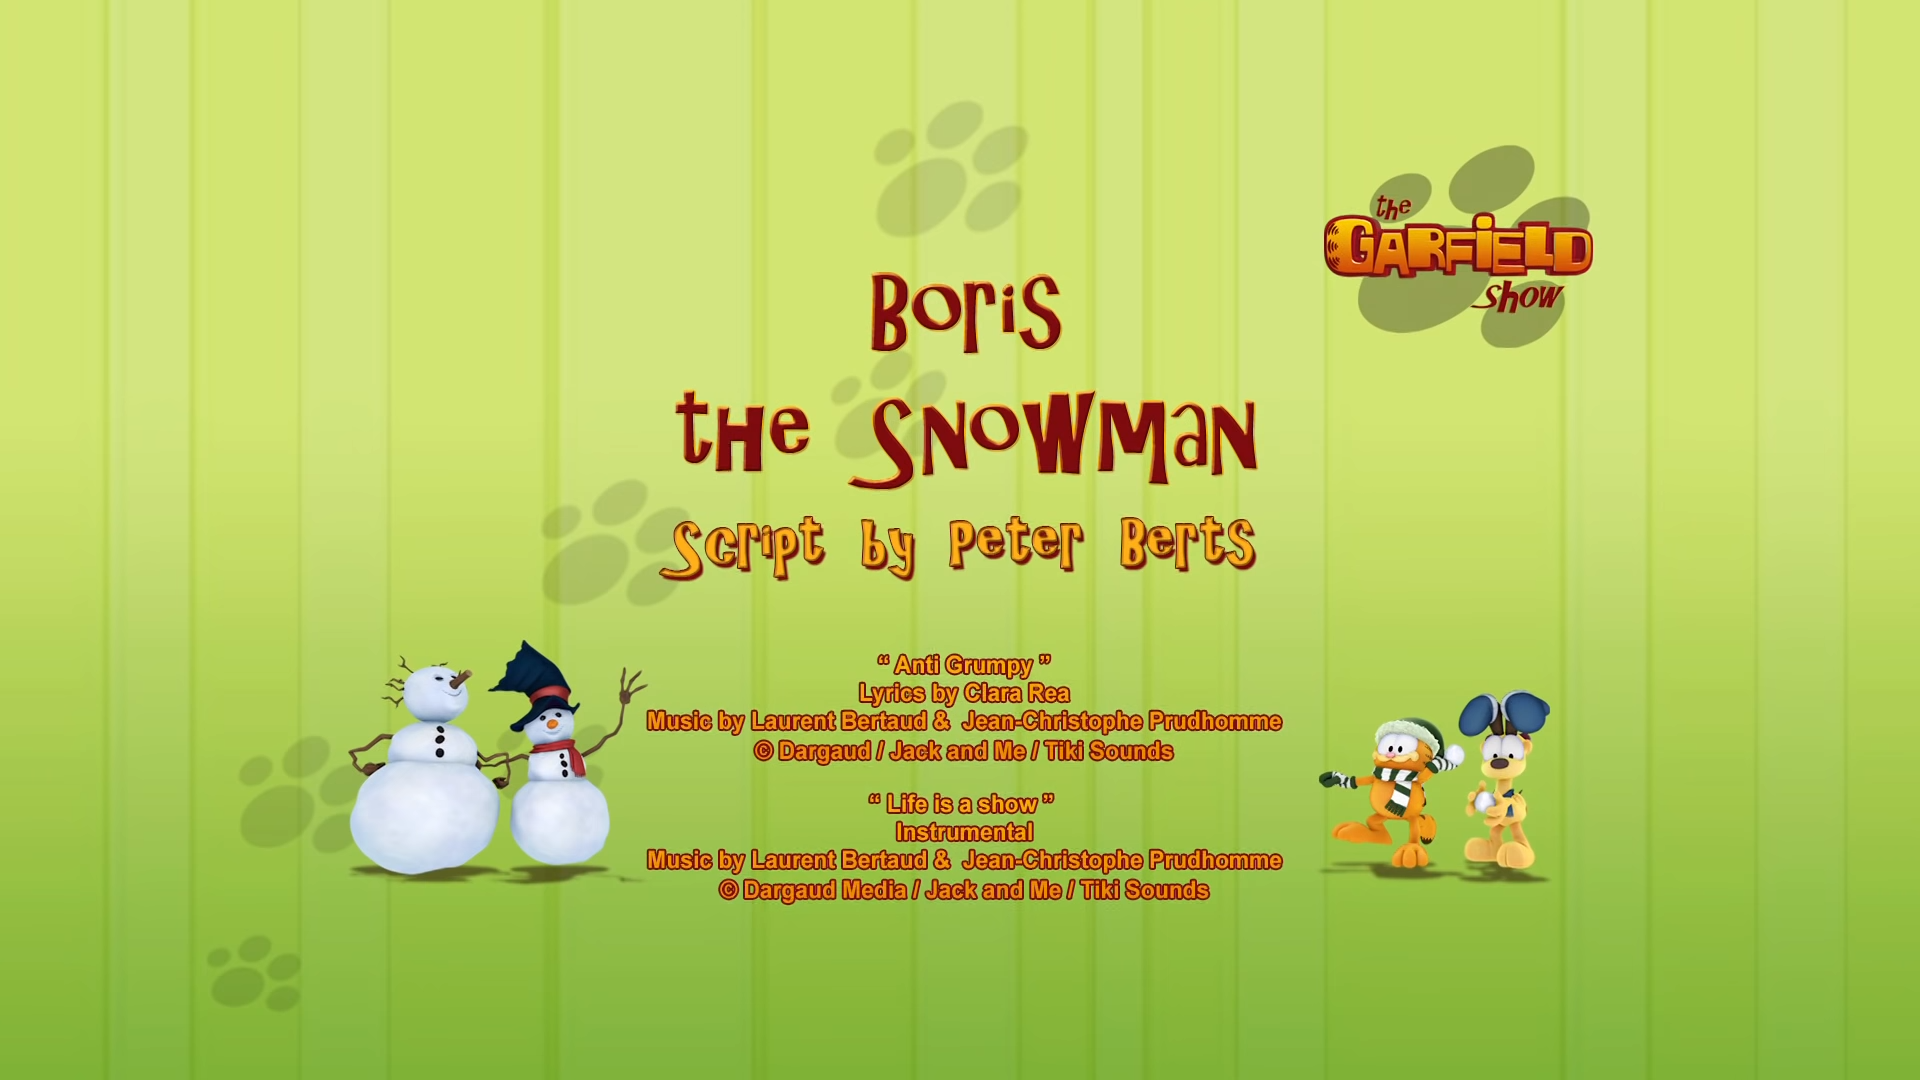 Boris the Snowman